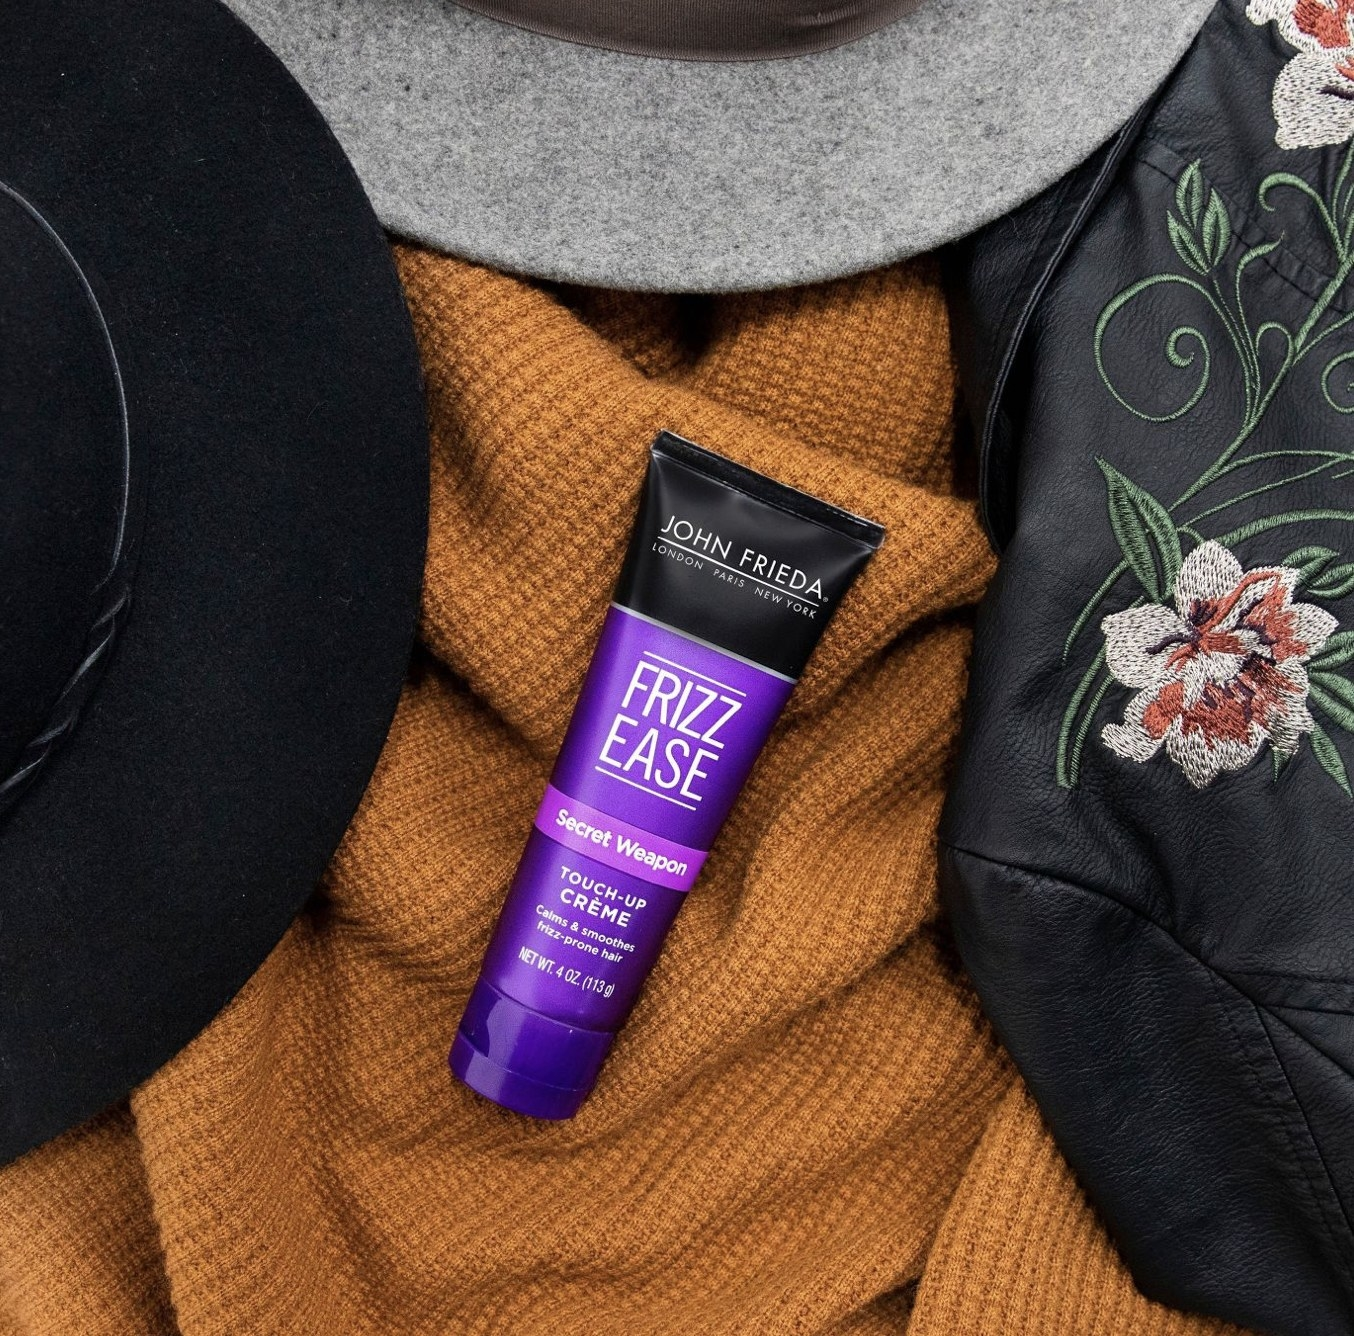 A tube of hair creme